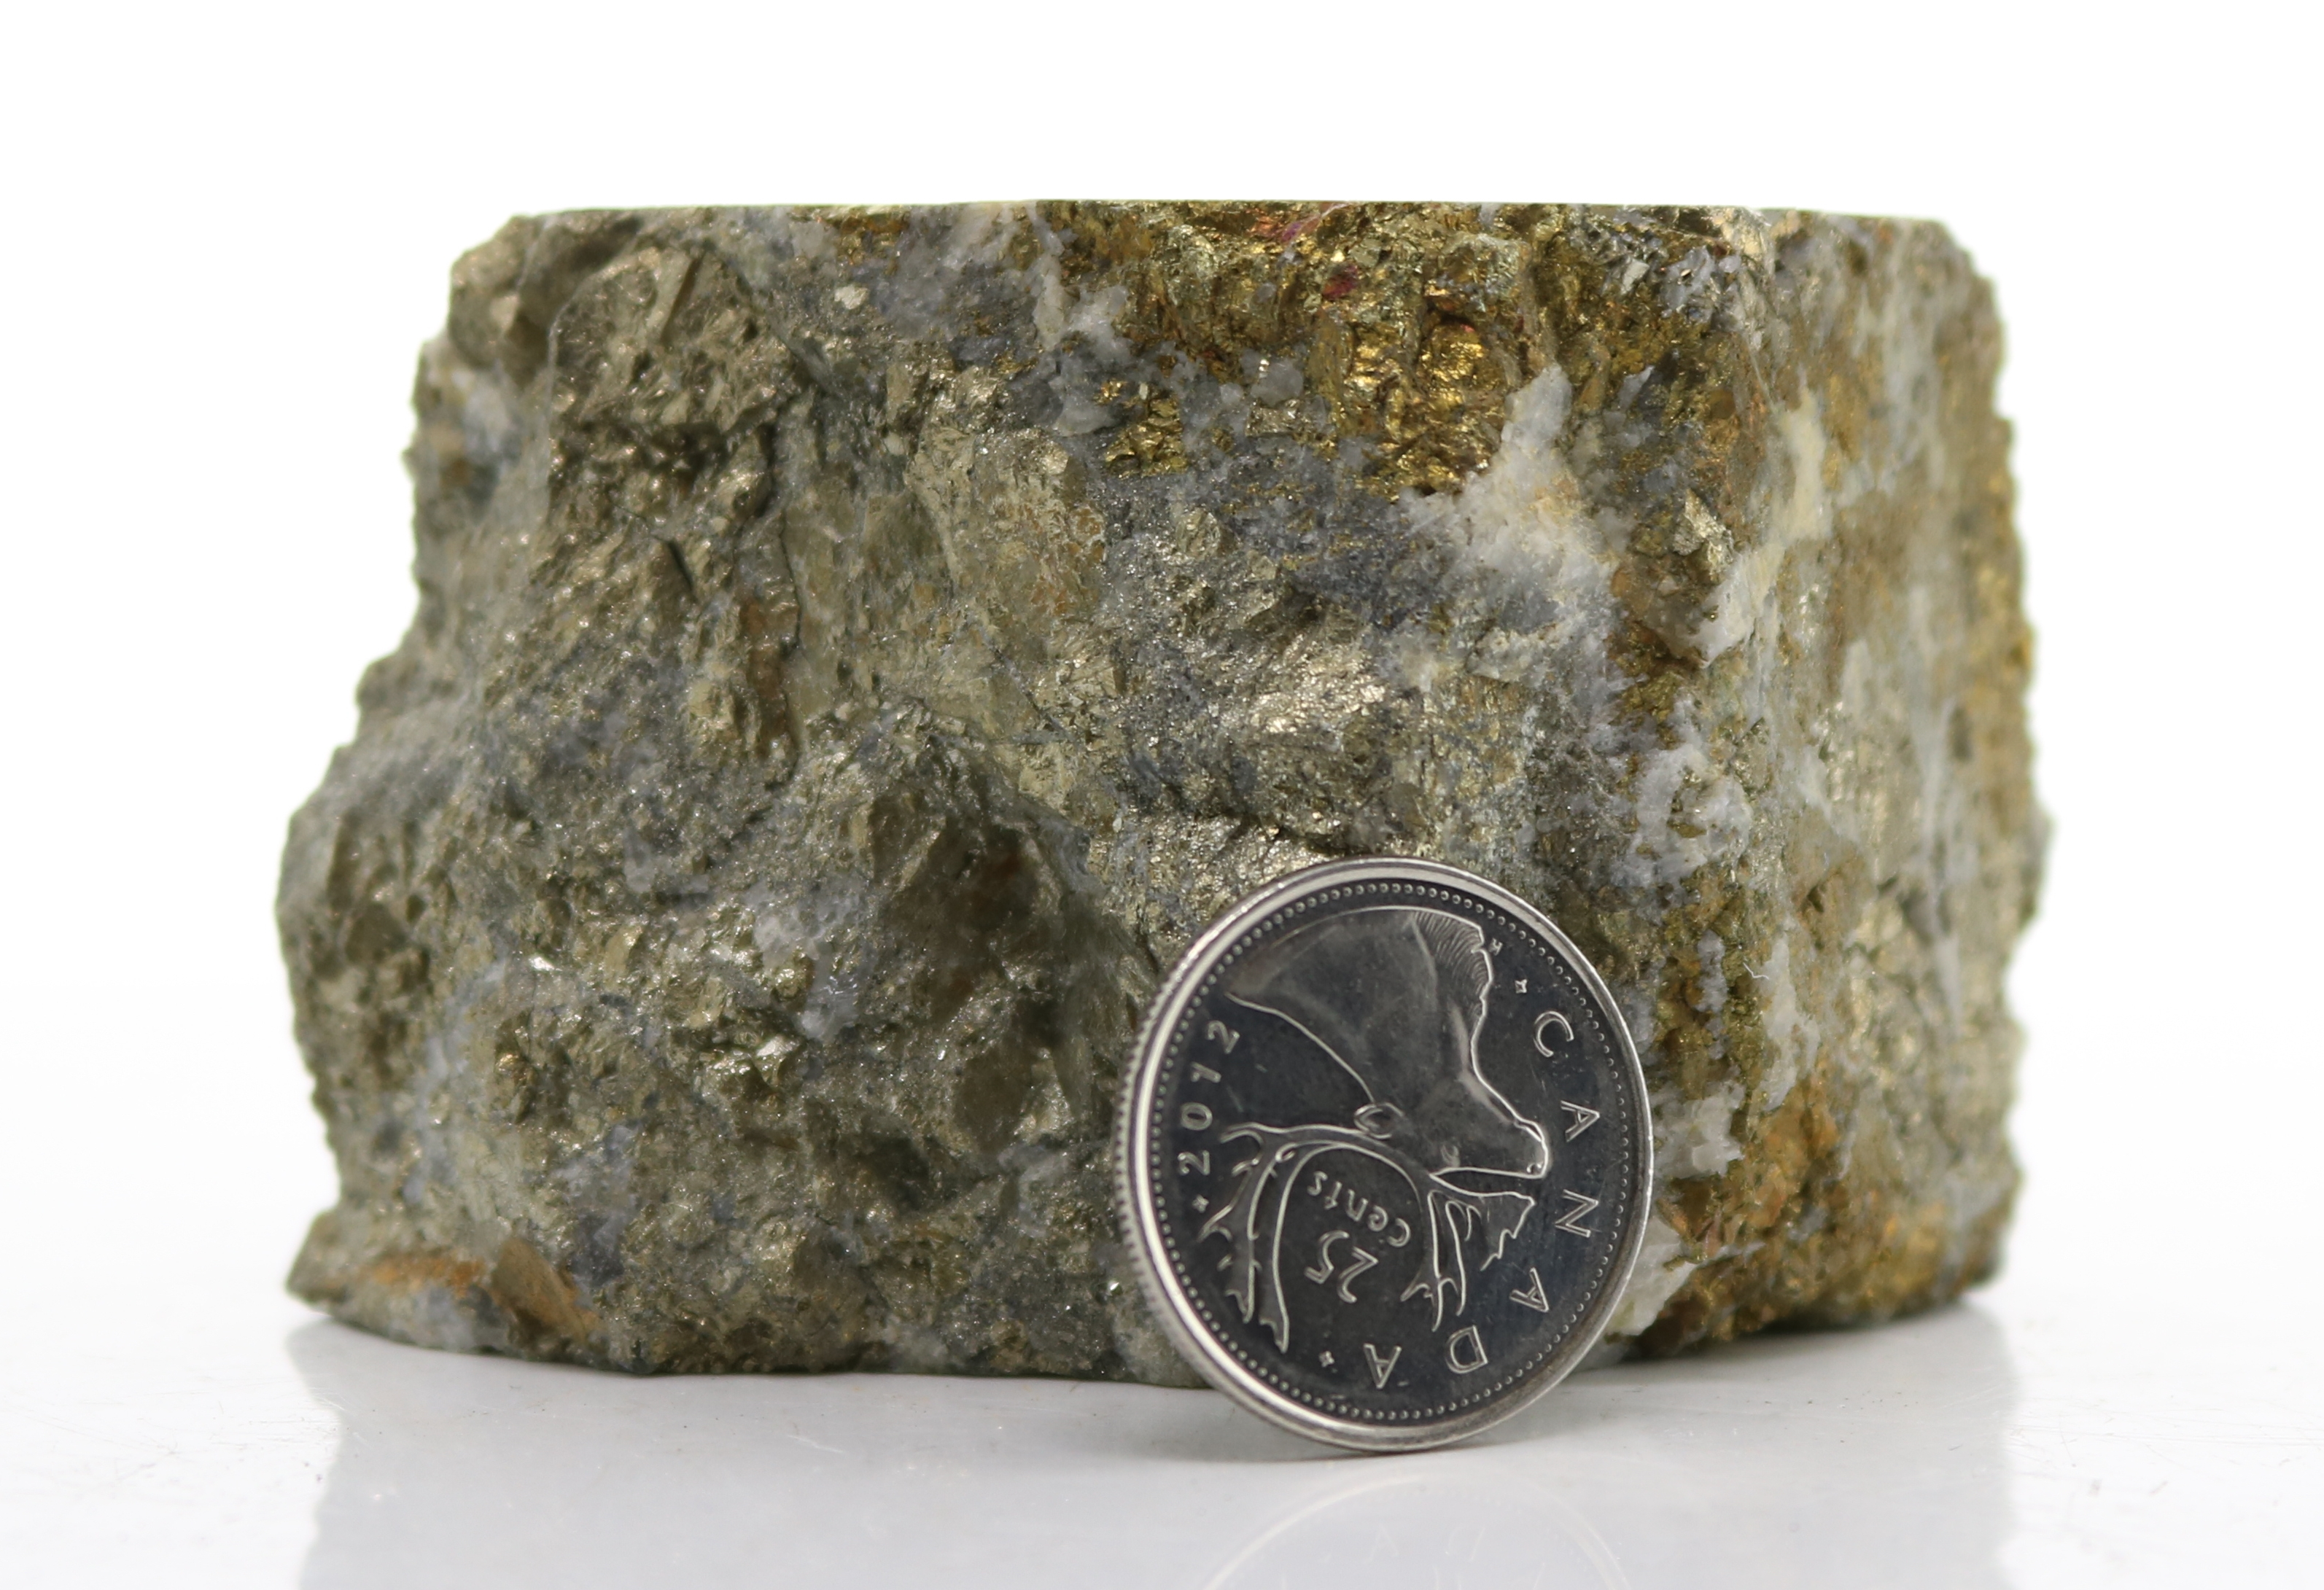 Pyrite-Chalcopyrite-Arsenopyrite(?)-Quartz vein (D34-19) Image